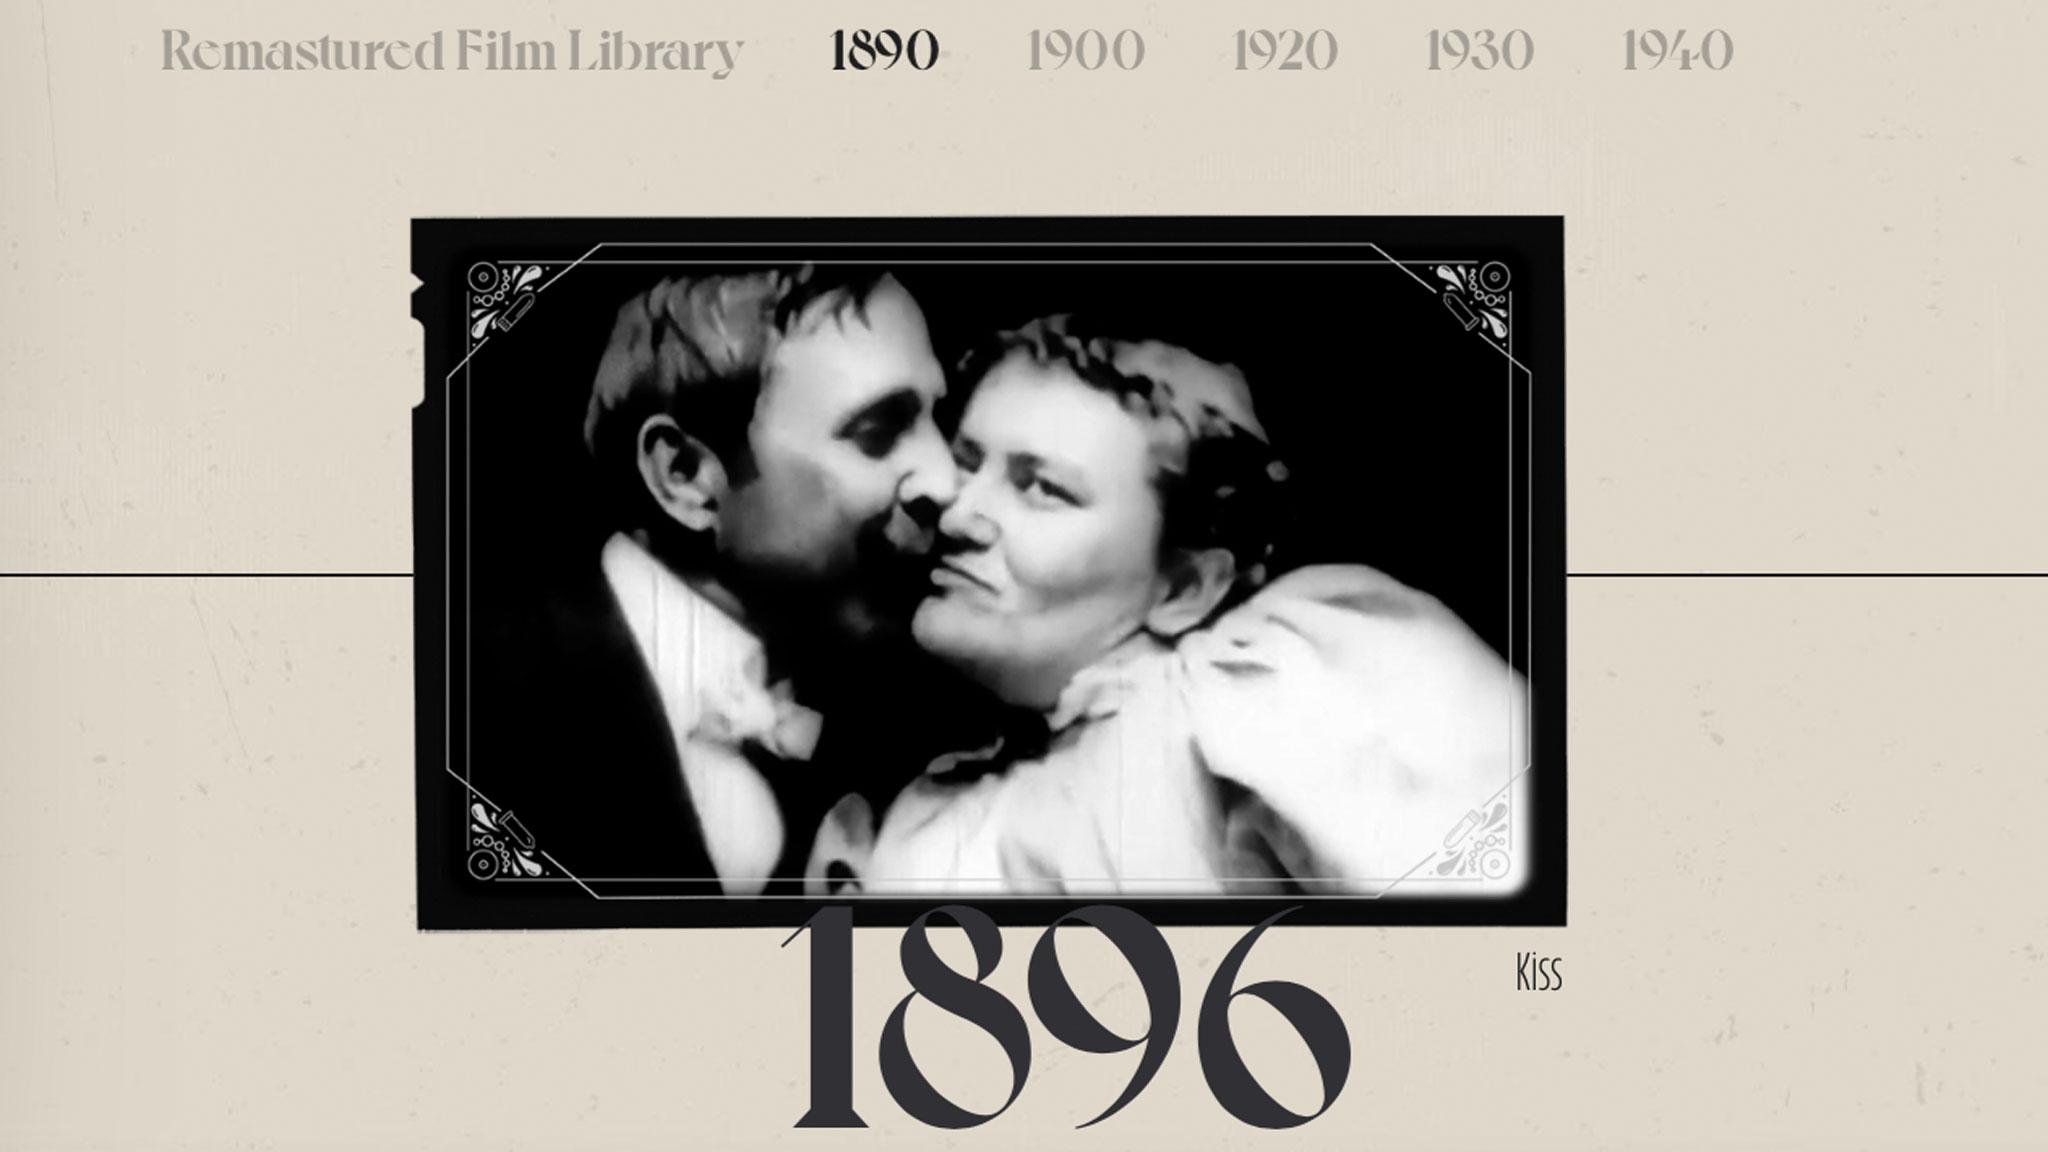 Historische erotikfilme